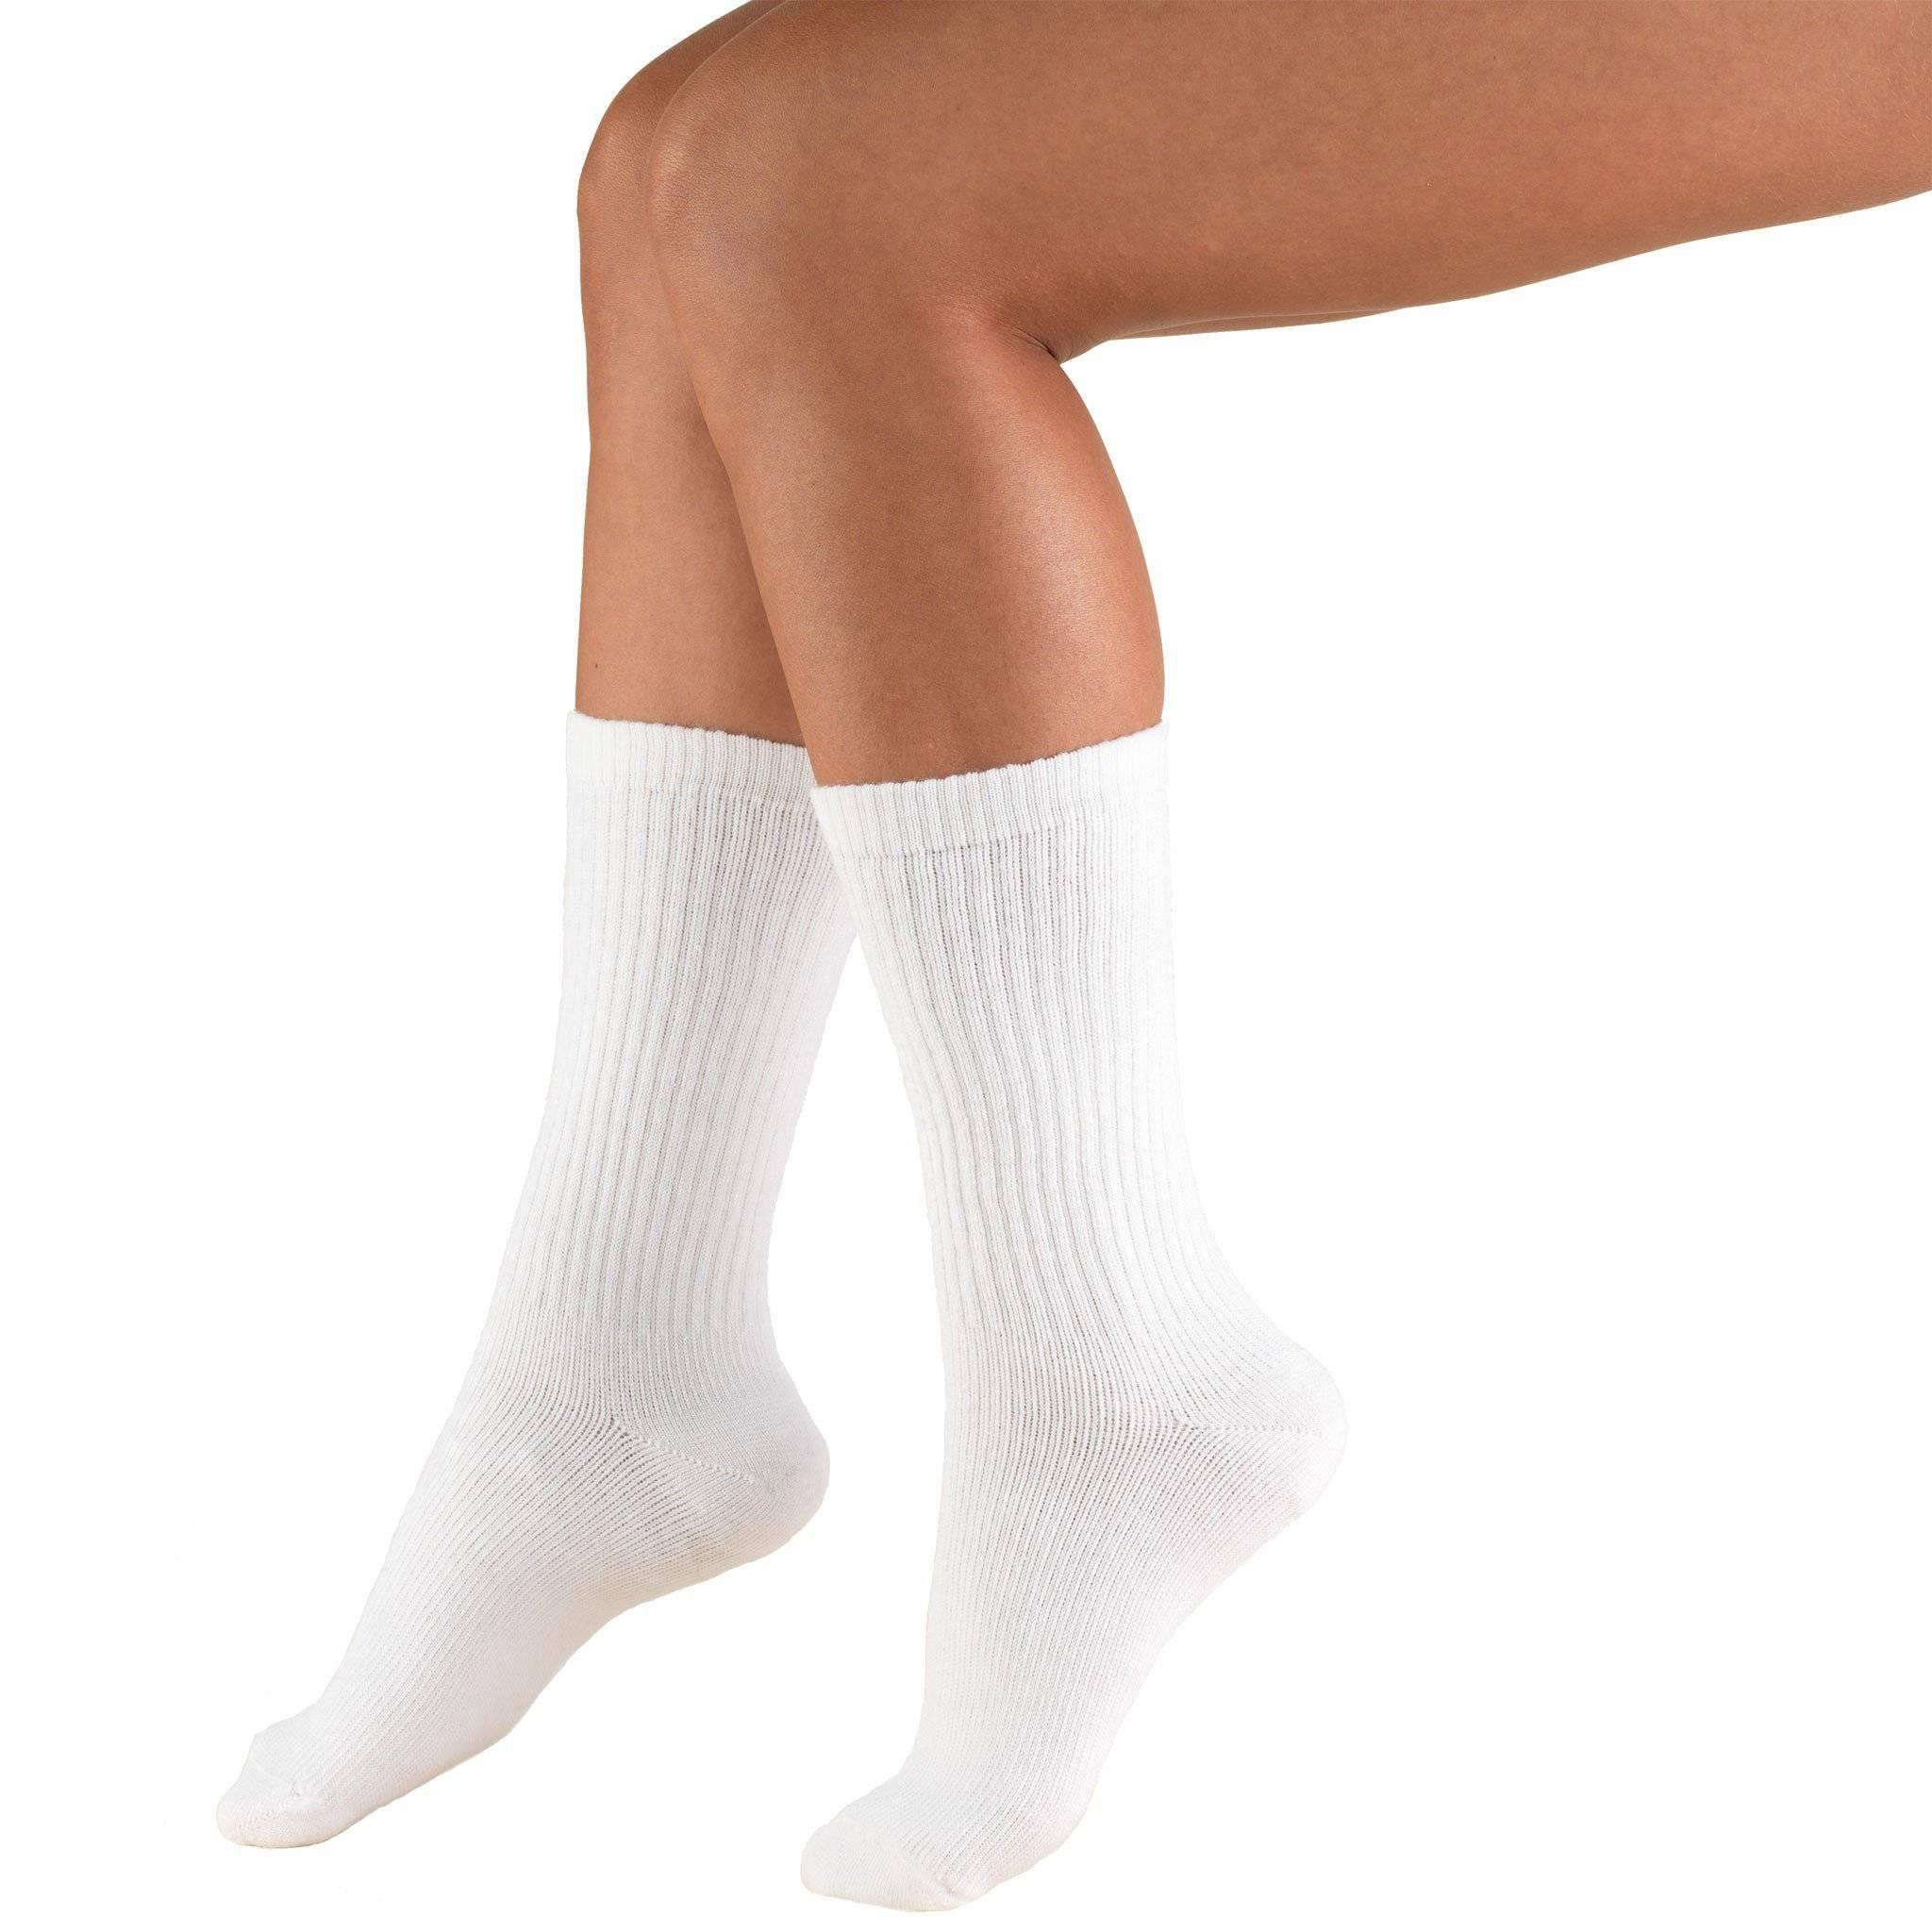 Crew Length TruSoft Socks